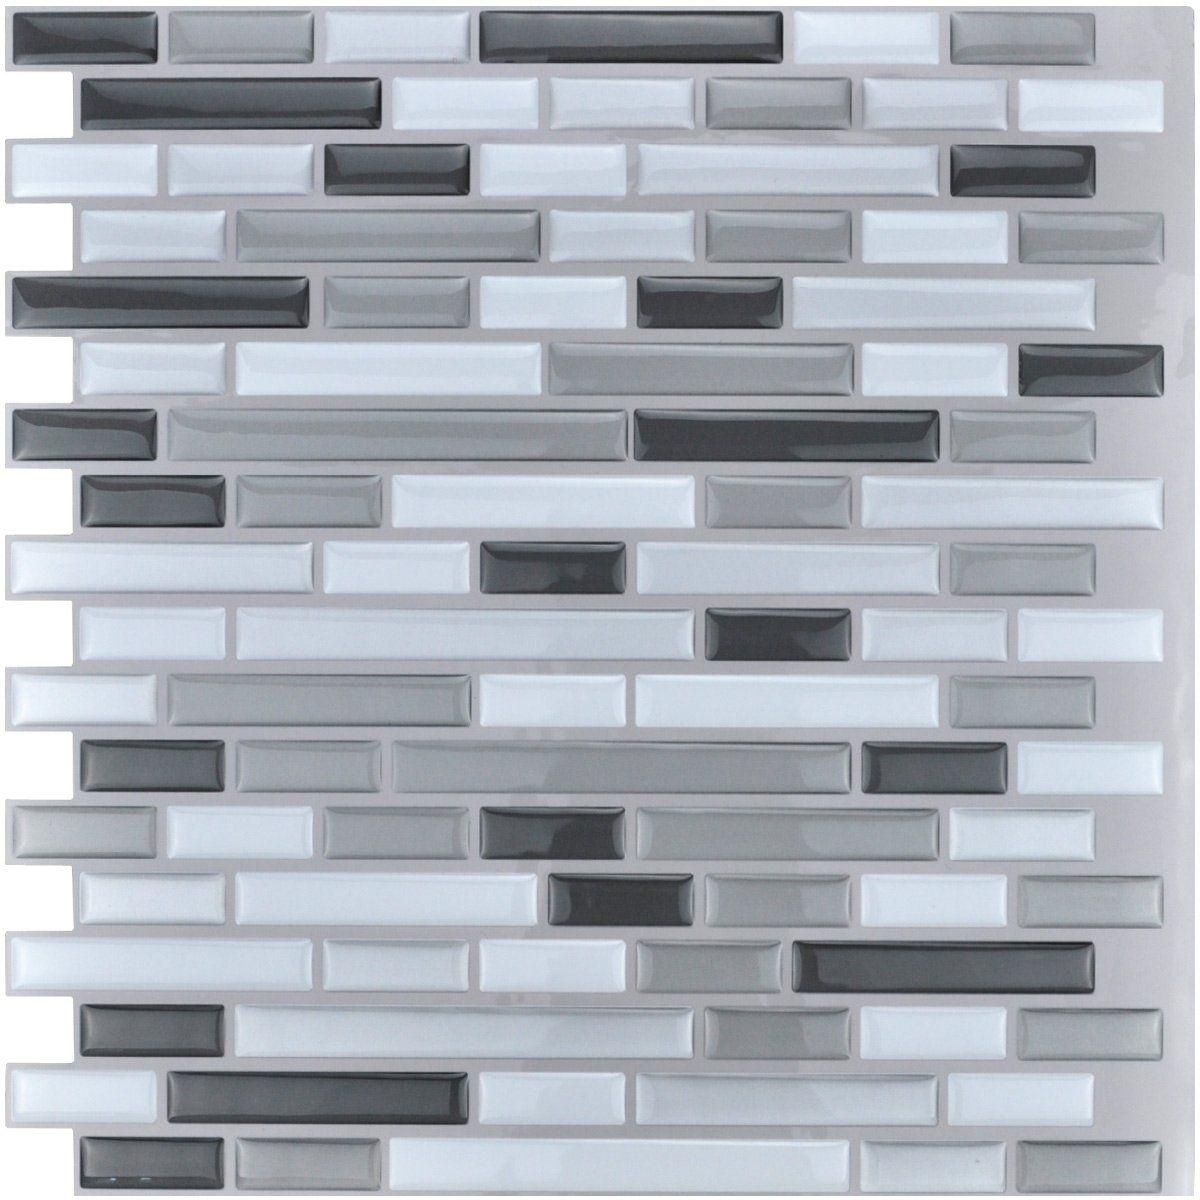 "Art3d 12"" x 12"" Peel and Stick Tile Kitchen Backsplash Sticker Gray Brick (6 Tiles)"